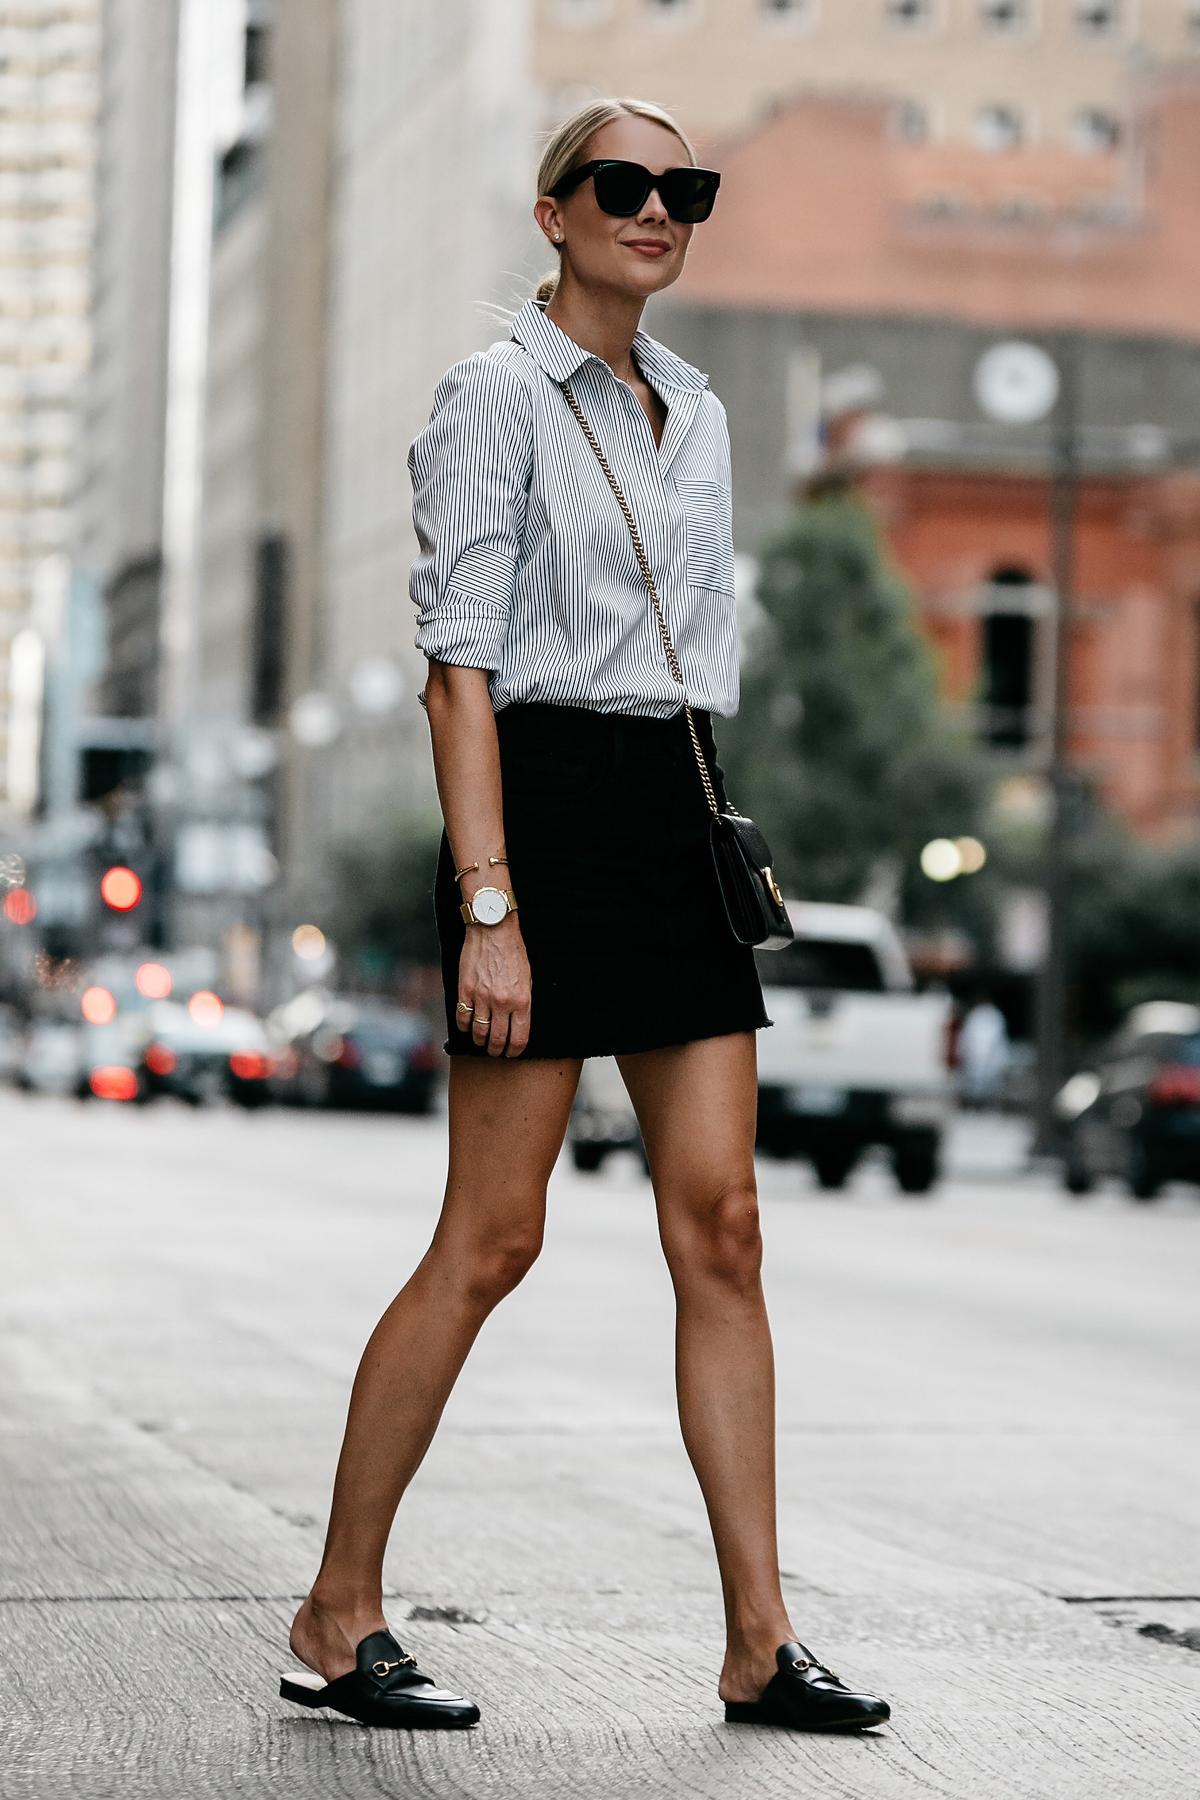 osment-handjob-blonde-black-dress-gucci-bag-sex